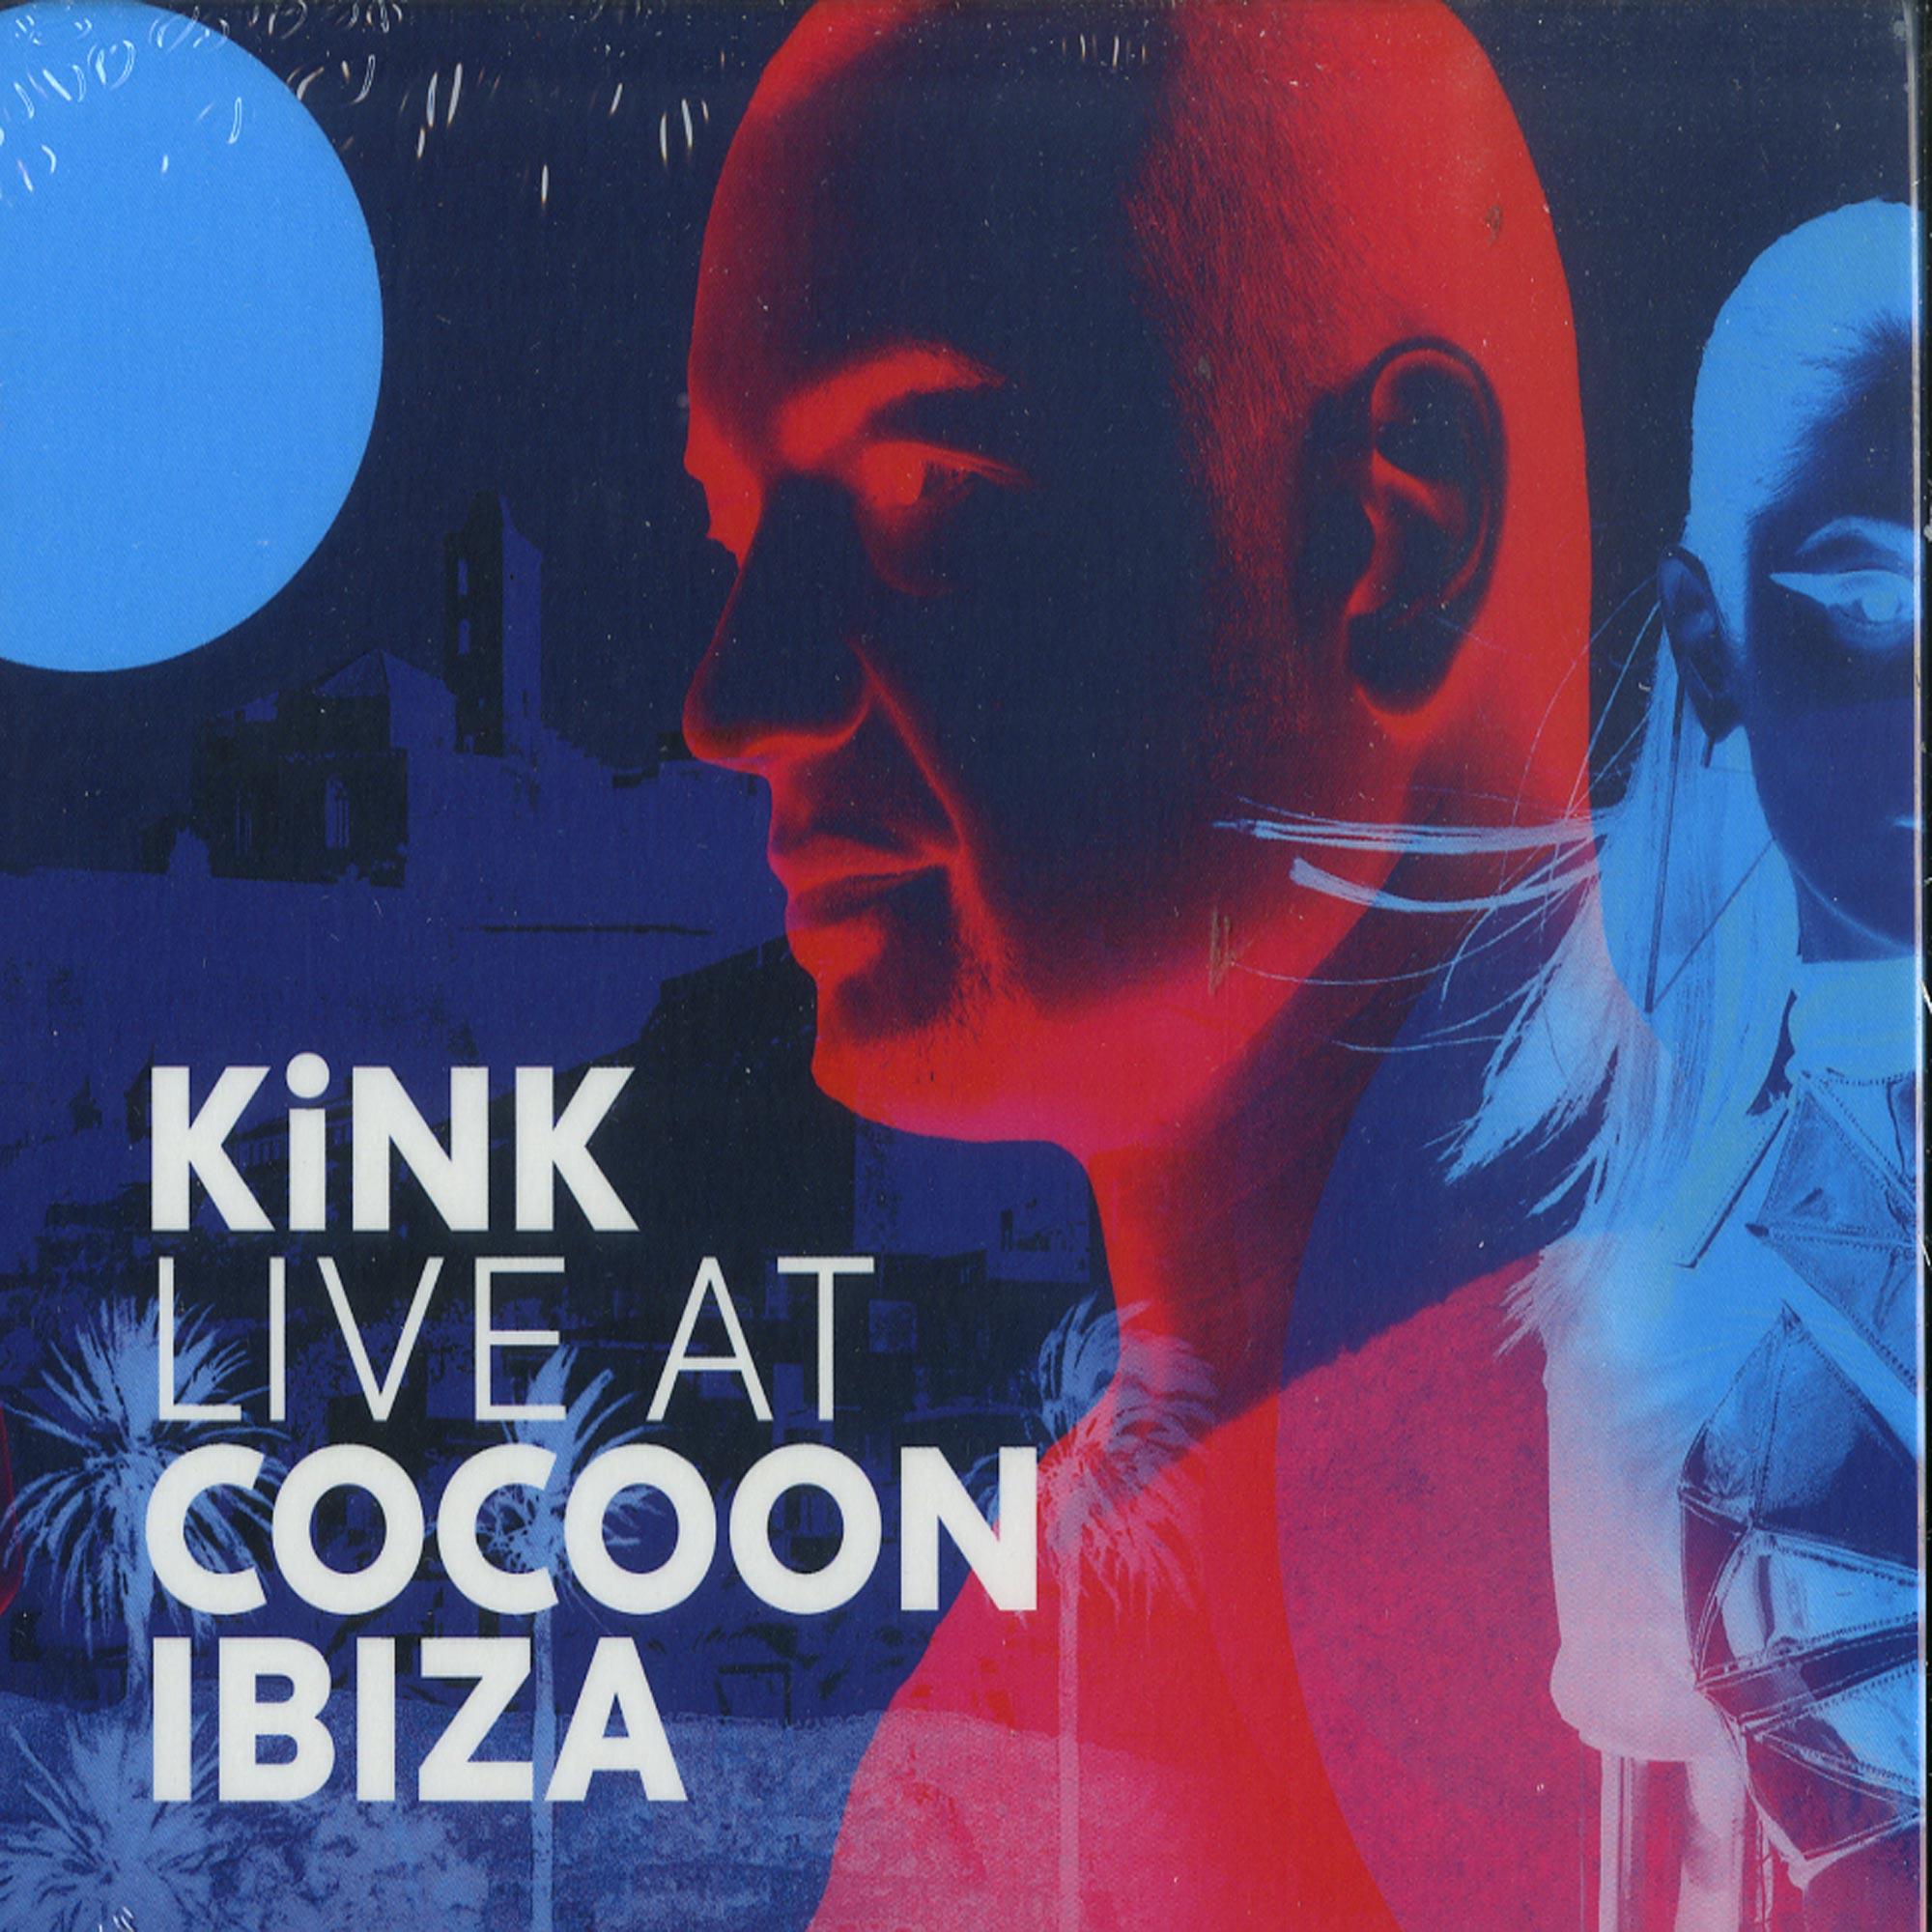 Kink - Live At Cocoon Ibiza